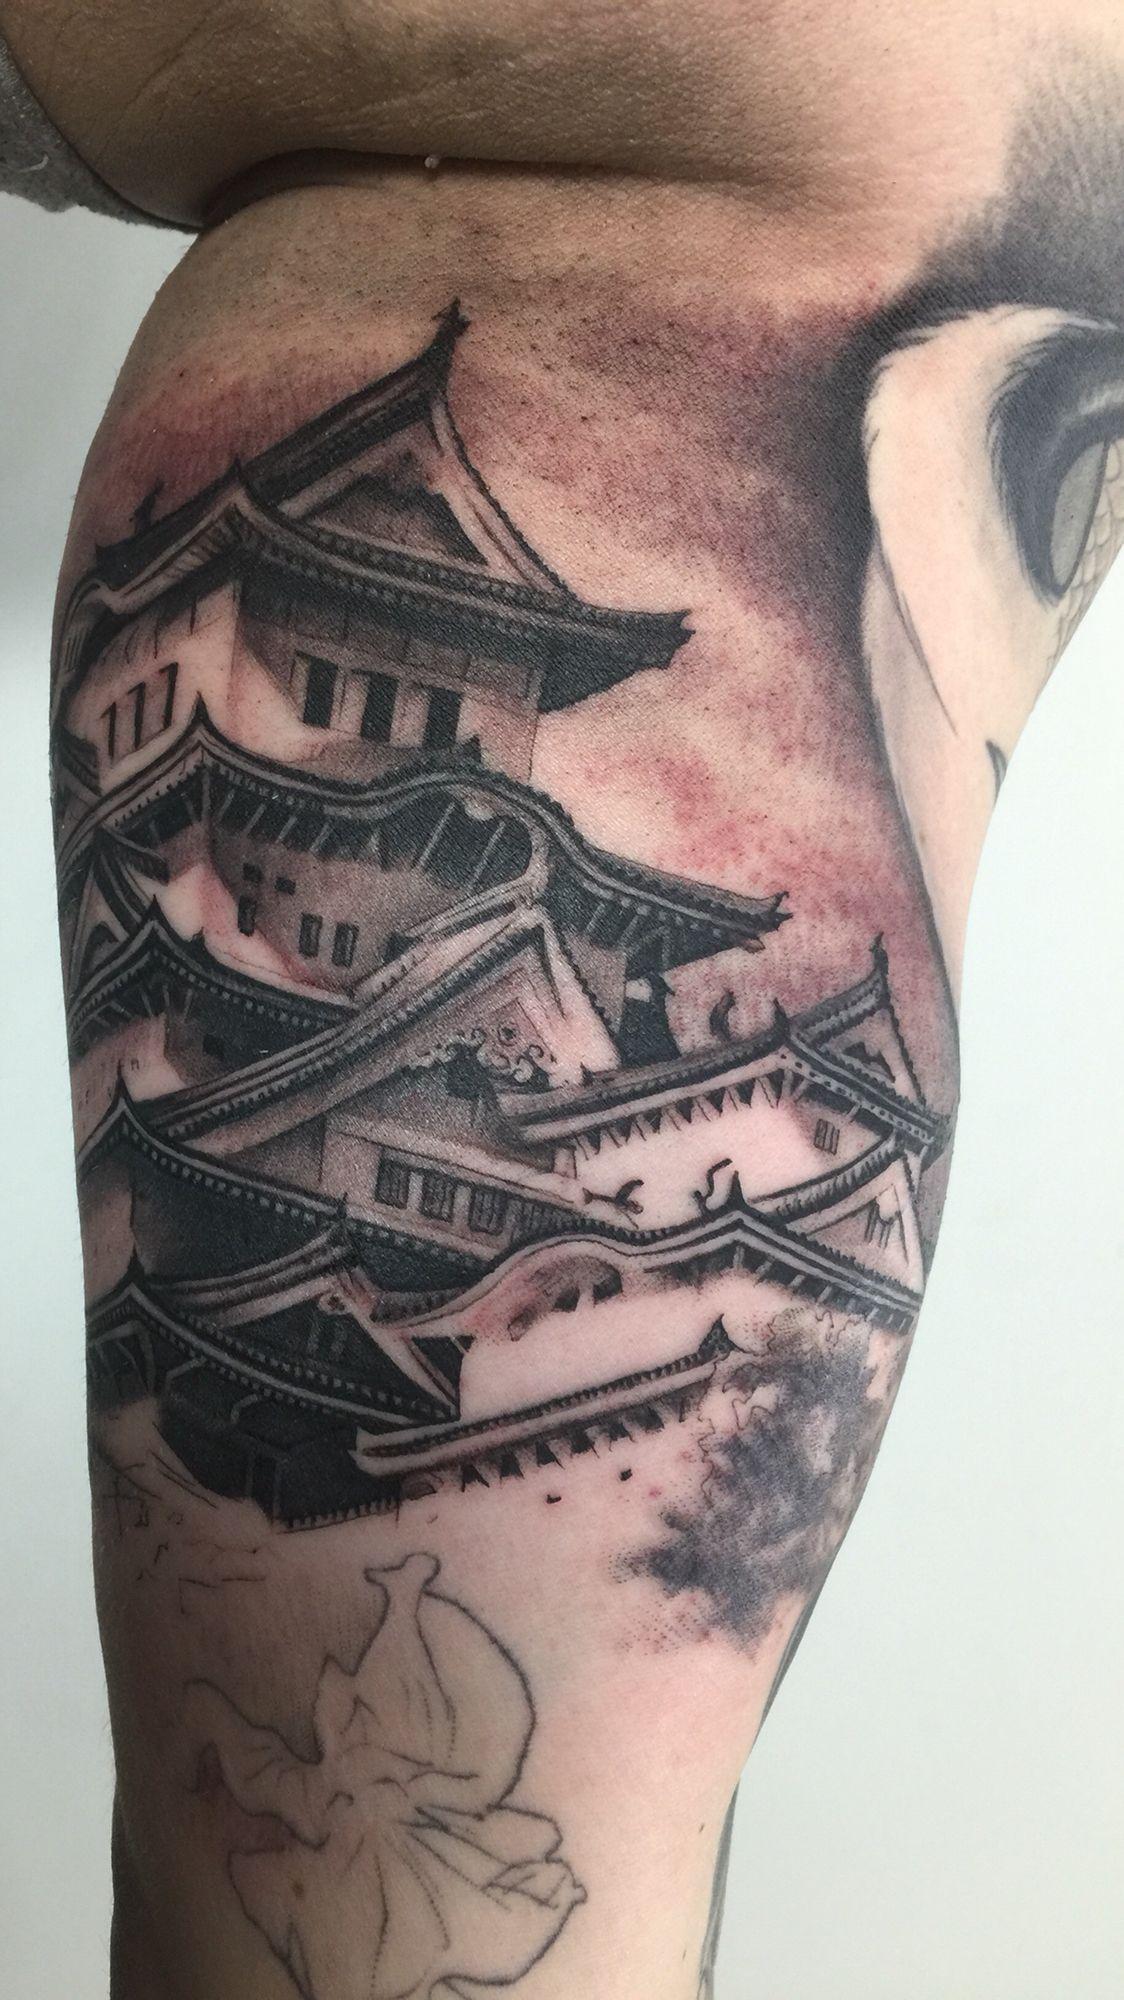 Las vegas tattoo pictures images photos photobucket - Amazing Work By Robert Pho Skin Design Tattoo Las Vegas